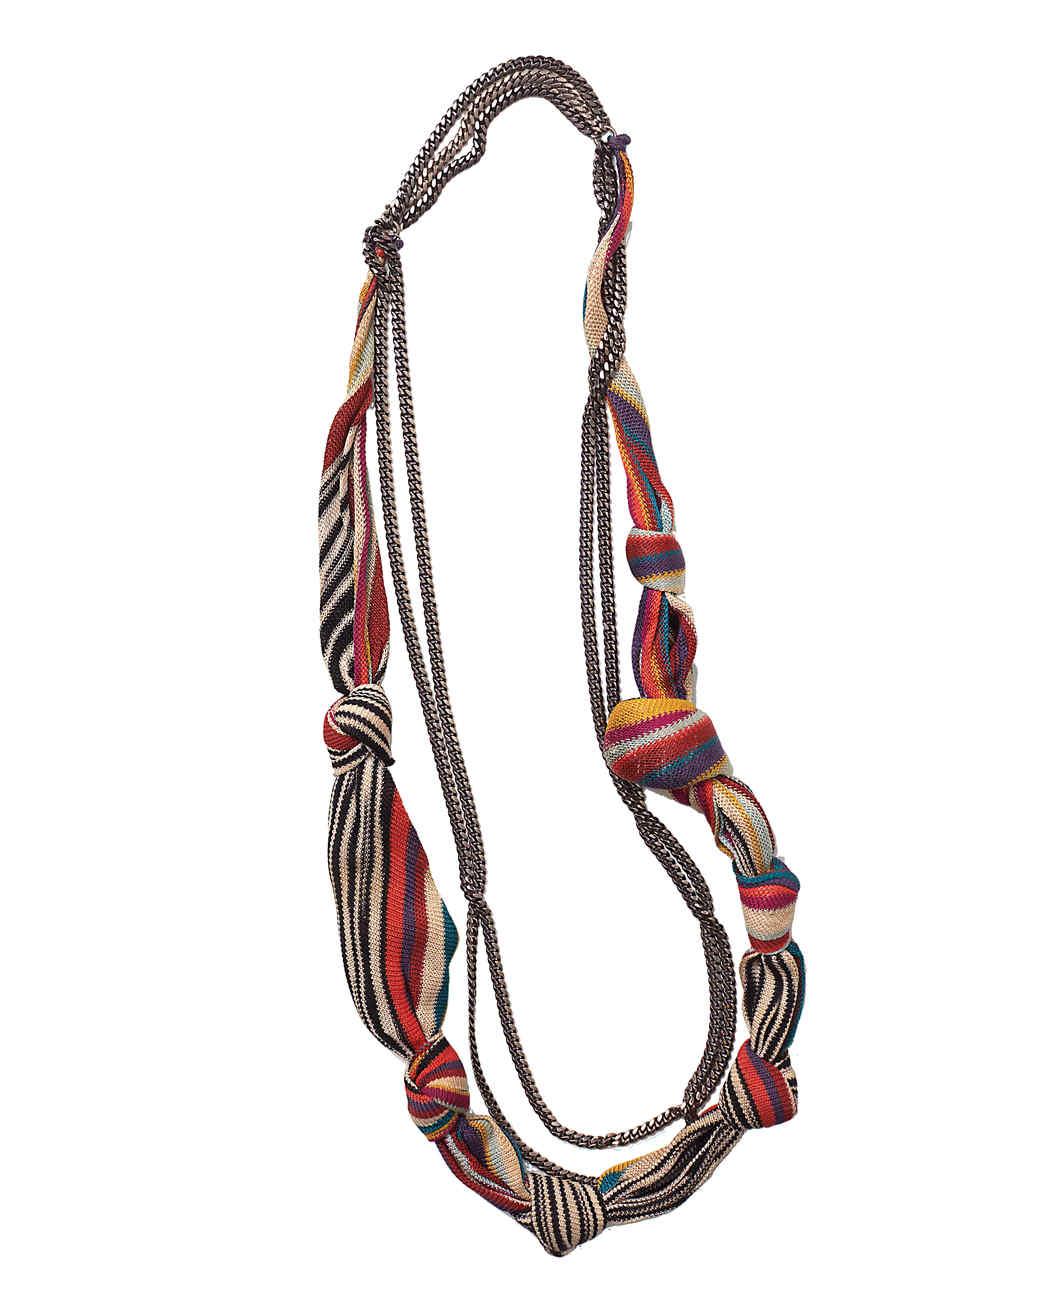 necklace-mld110945.jpg